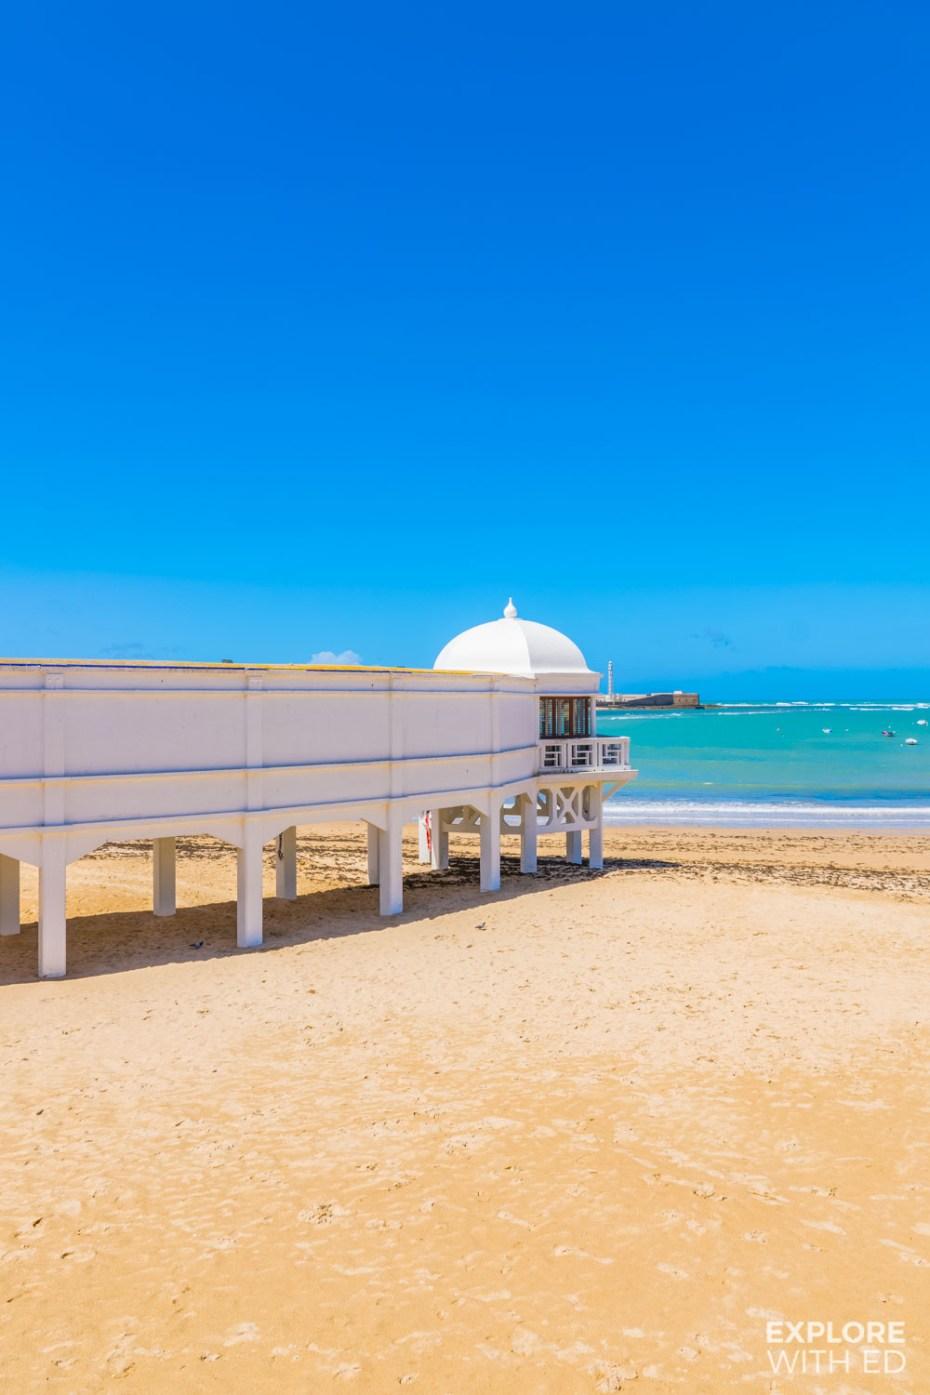 La Caleta beach in Cadiz